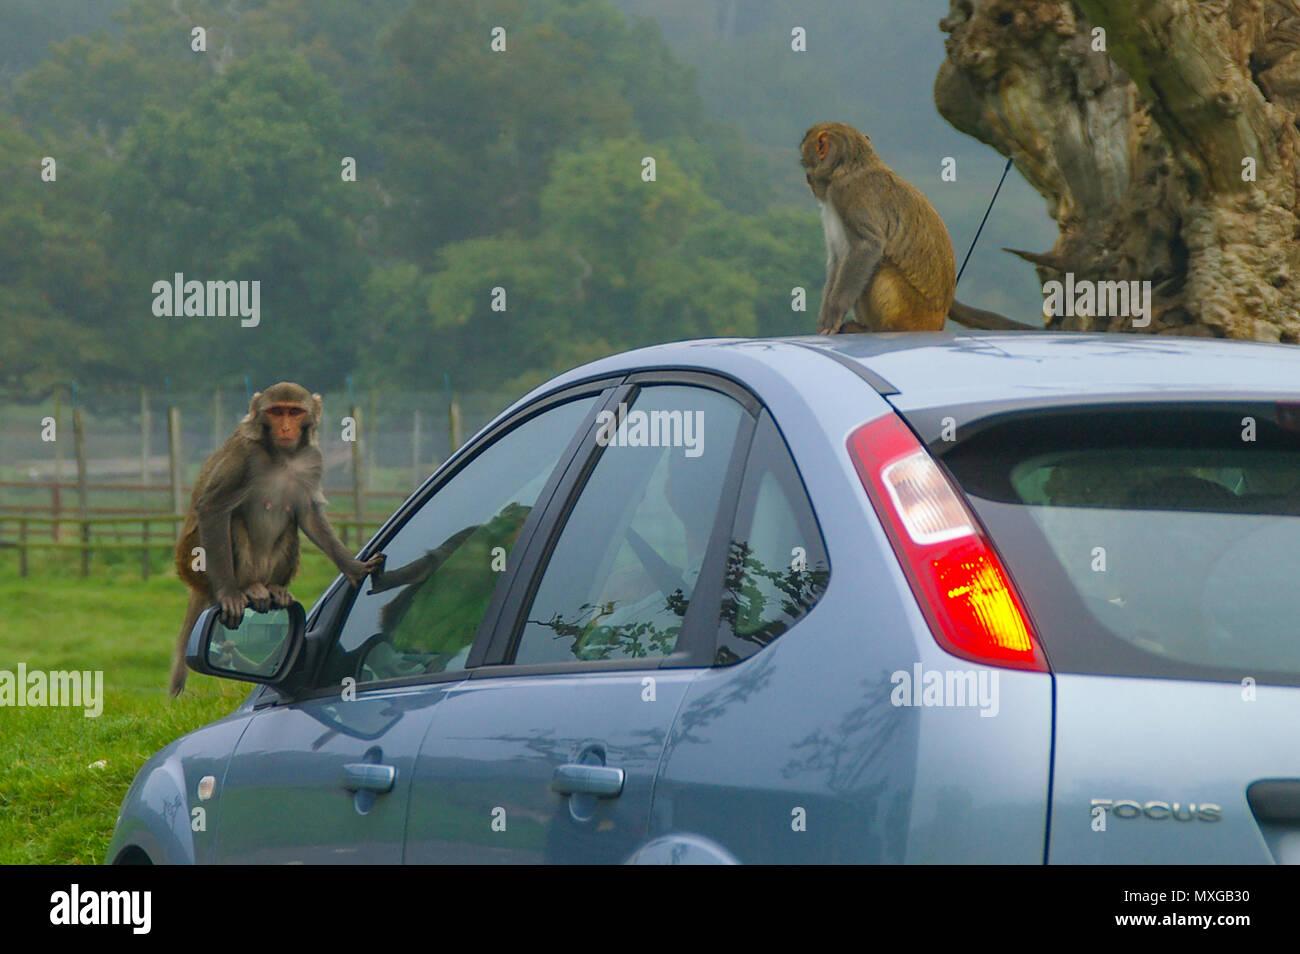 monkeys-on-a-car-in-longleat-safari-park-uk-rhesus-monkeys-riding-on-car-rhesus-macaque-macaca-mulatta-drive-through-safari-park-MXGB30.jpg